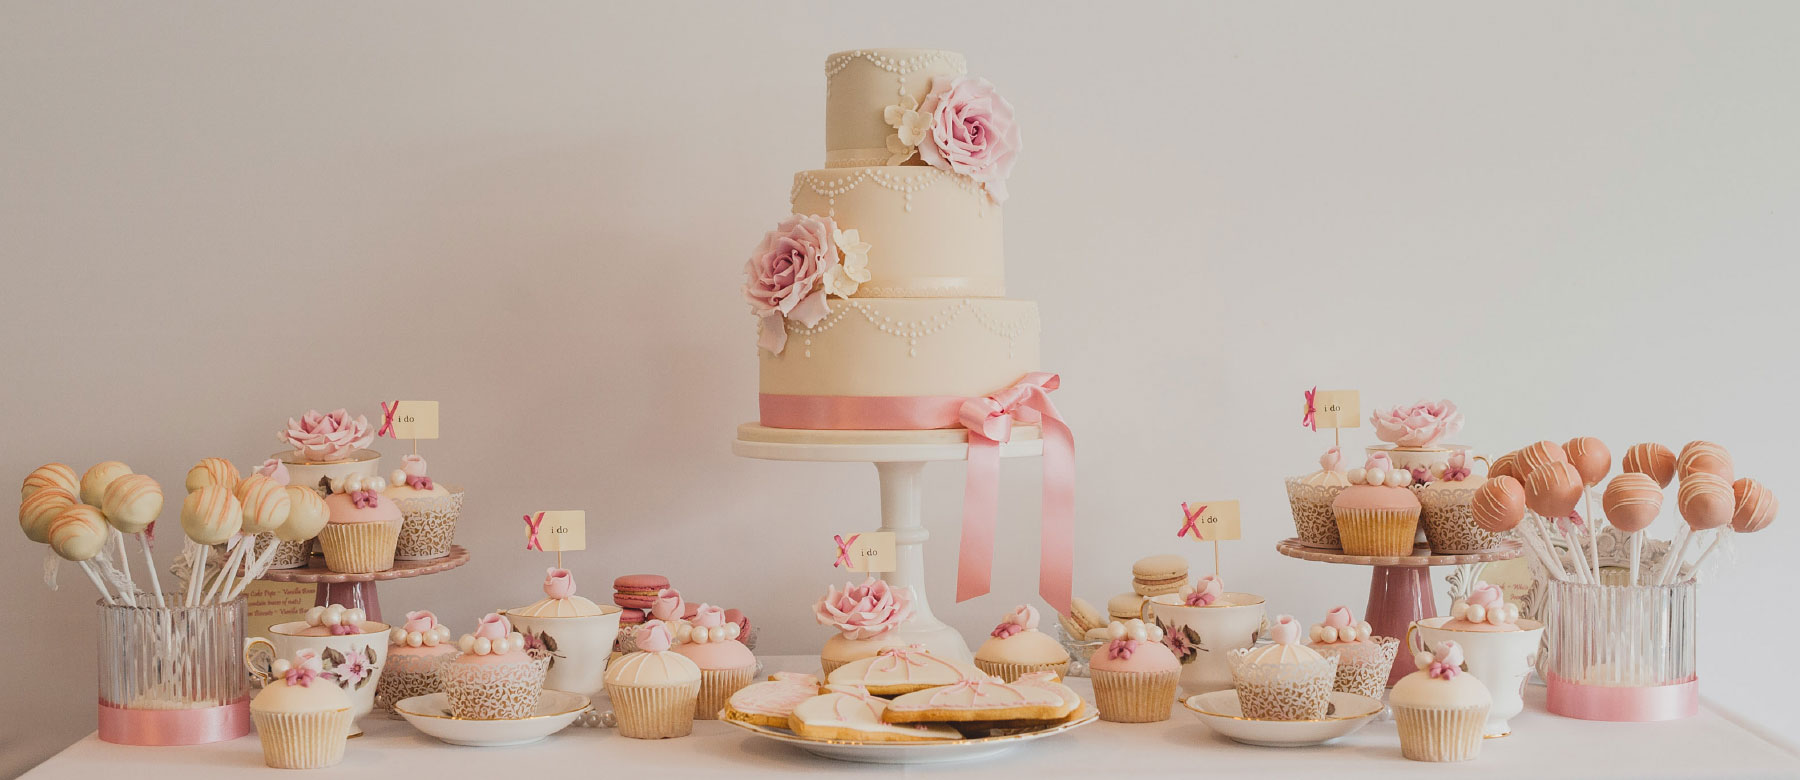 Wedding Planner, Wedding Advice, Wedding Help, Wedding Rescue Service, Wedding Organiser, Wedding Co-Ordinator